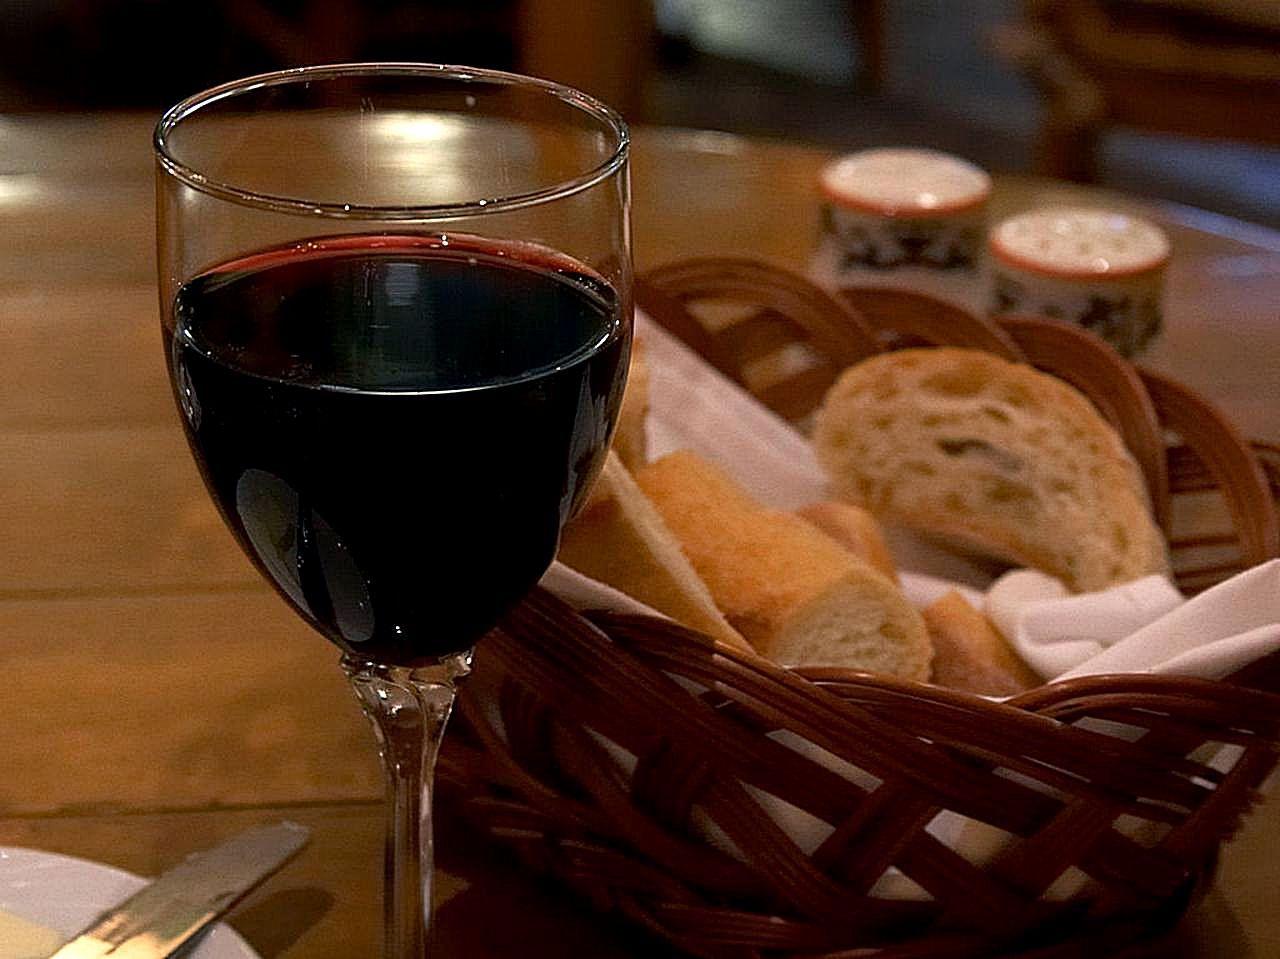 Red_wine_in_an_Italian_restaurant.jpg